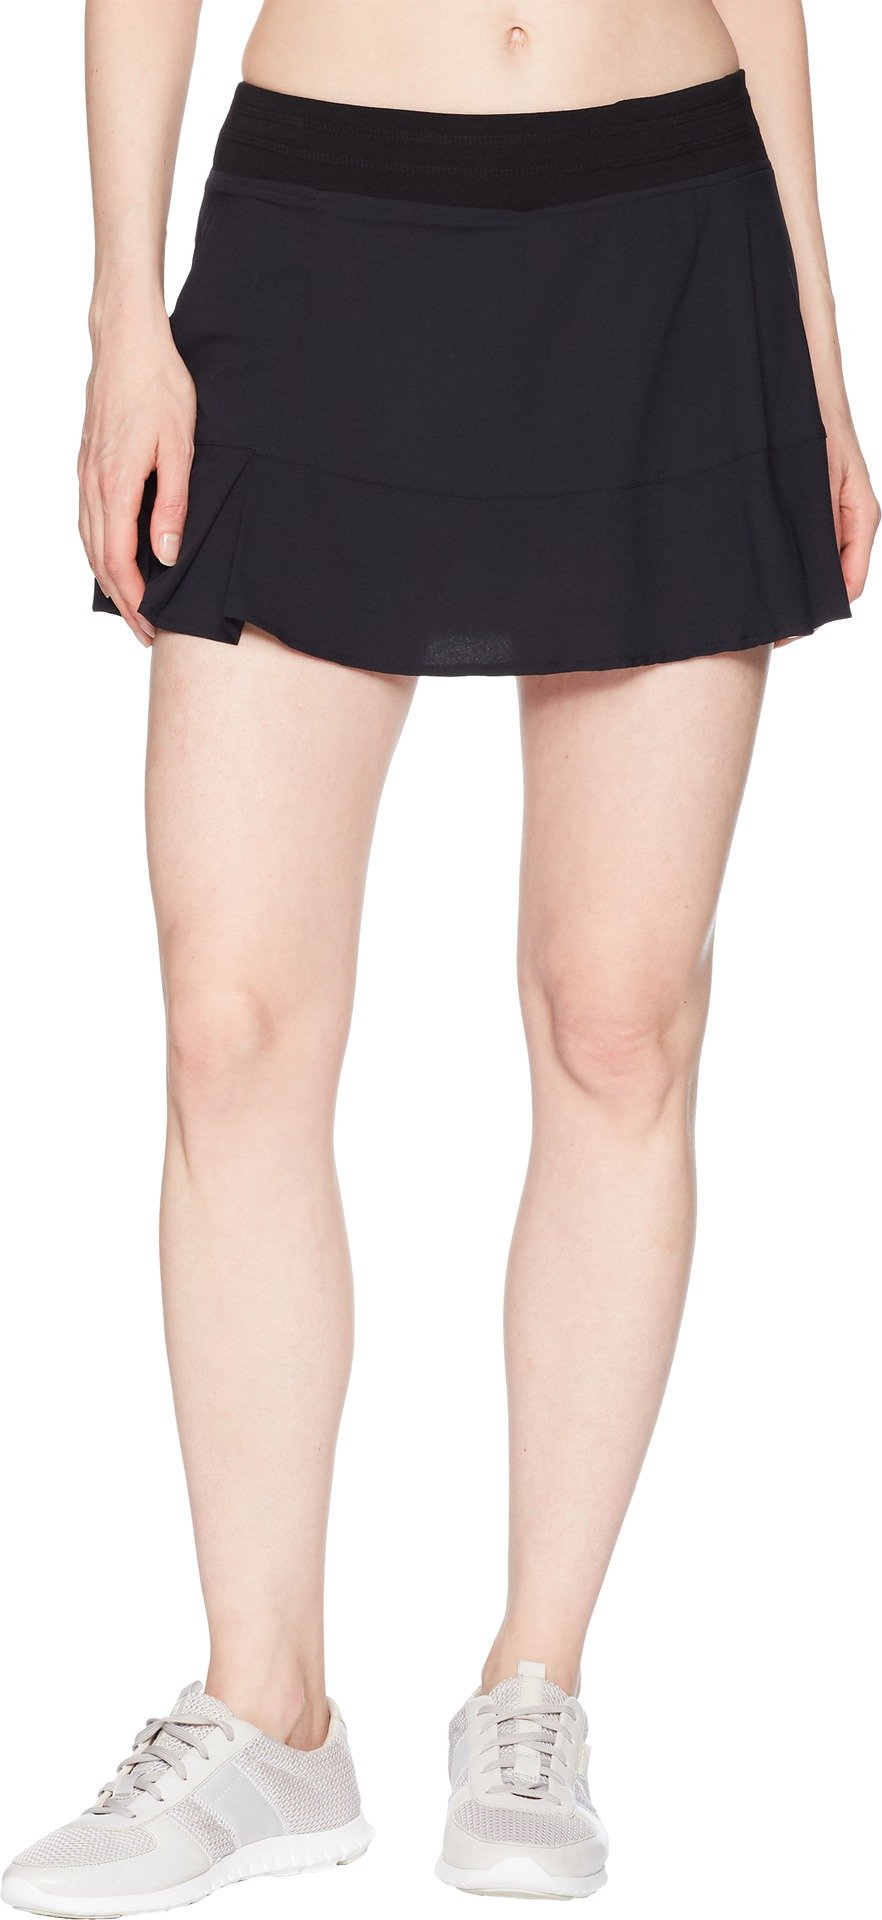 tasc Performance Rhythm Skirt, Black, Medium